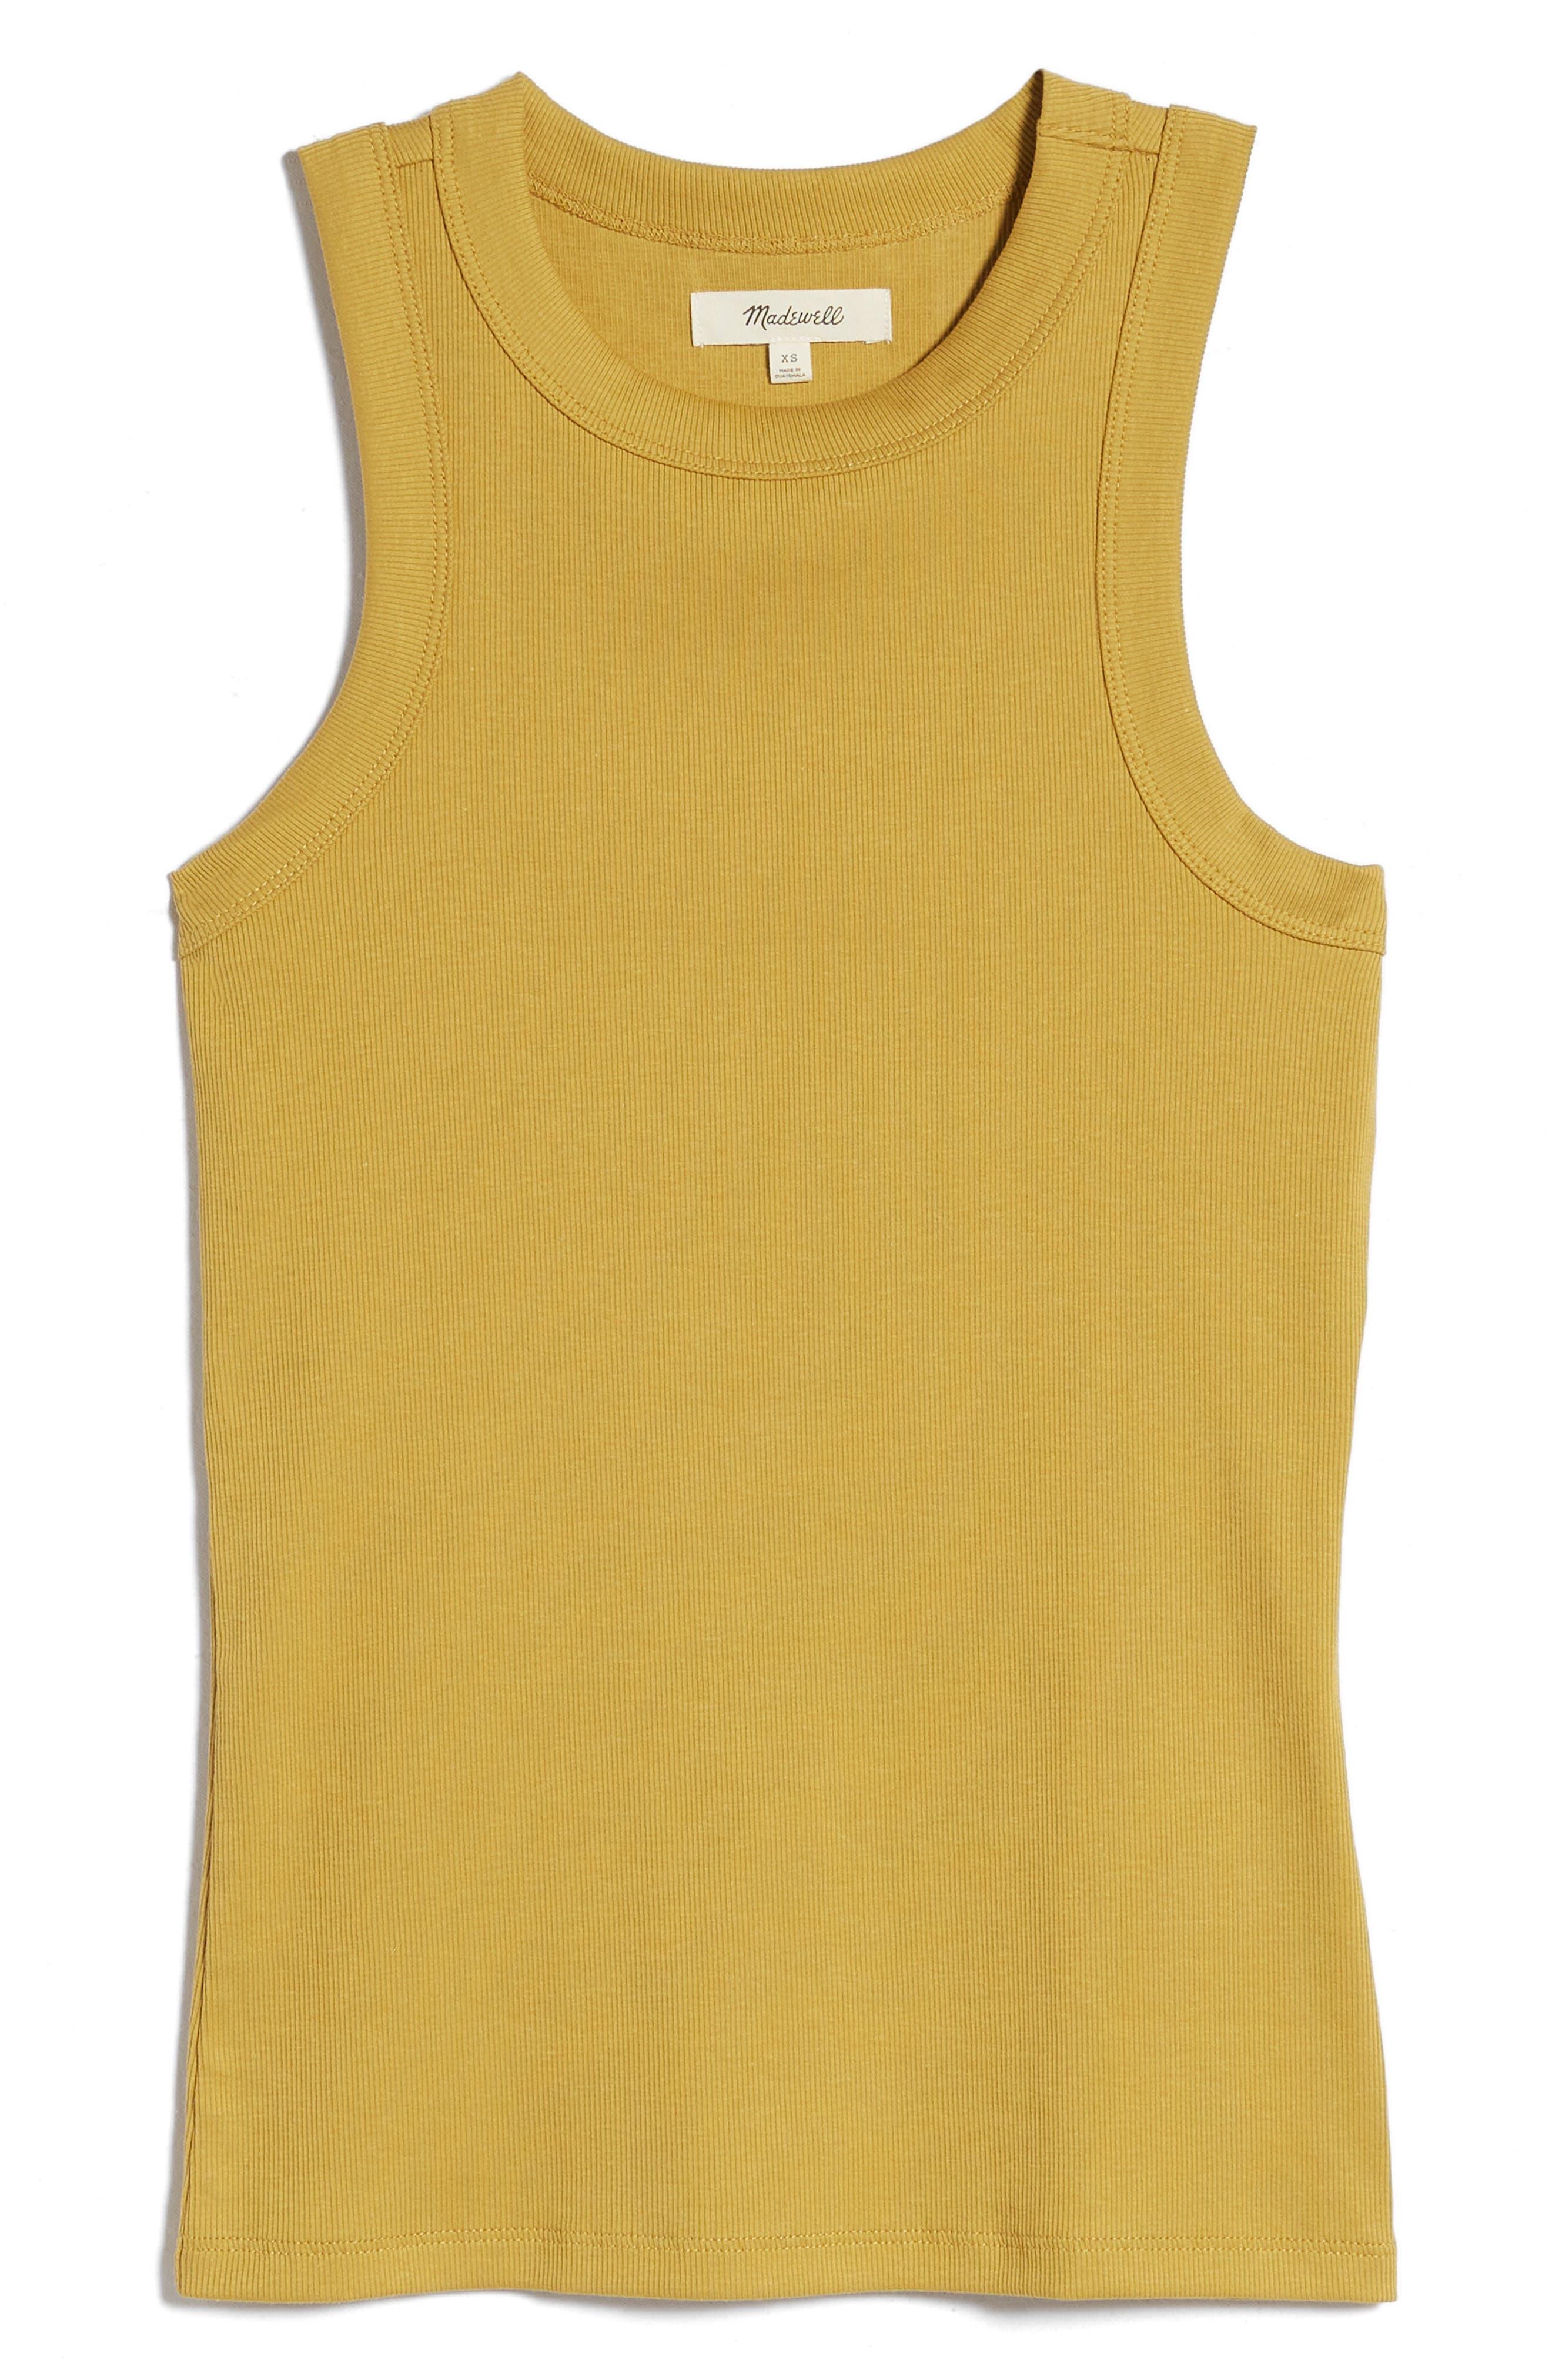 Jones New York Top Colorful Geo Style Chic Sleeveless High Neck Tank  size S